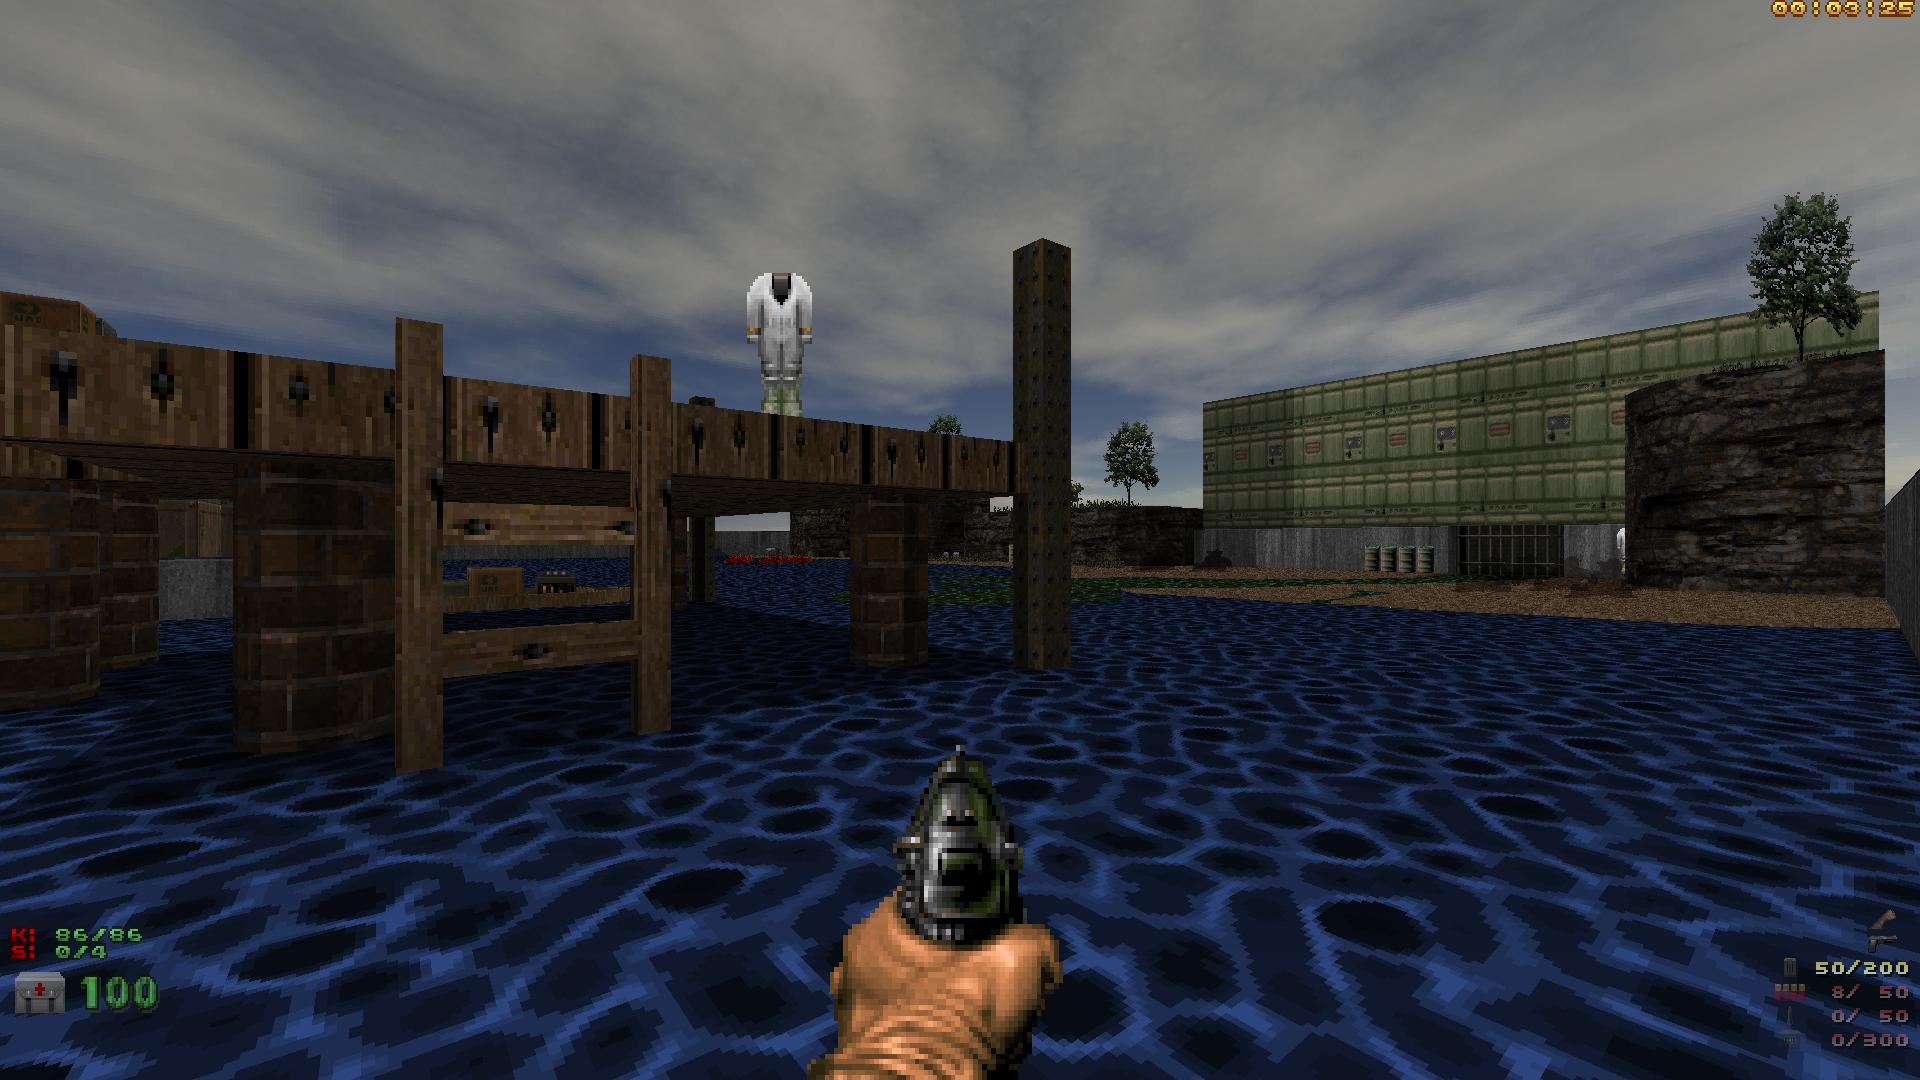 Screenshot_Doom_20210322_090820.png.60eb80fa5919bee4e5b96771741a55a3.png